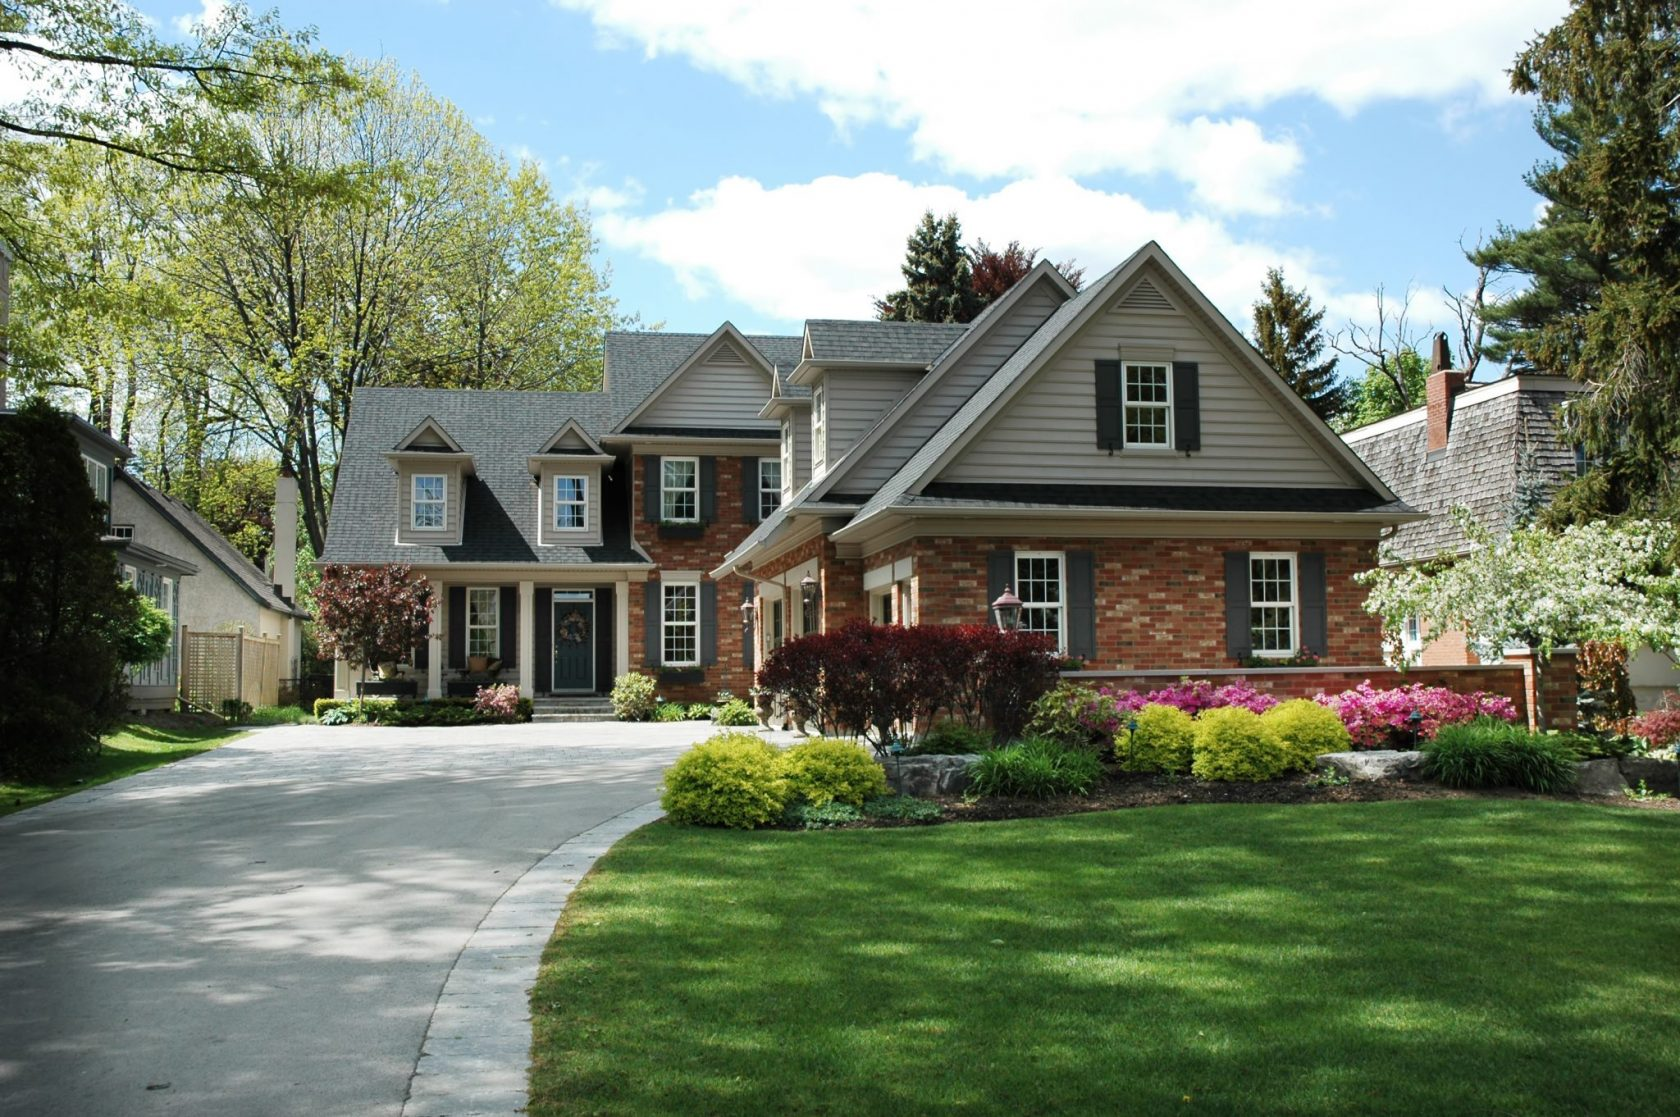 home staging Burlington real estate listings | Team Logue